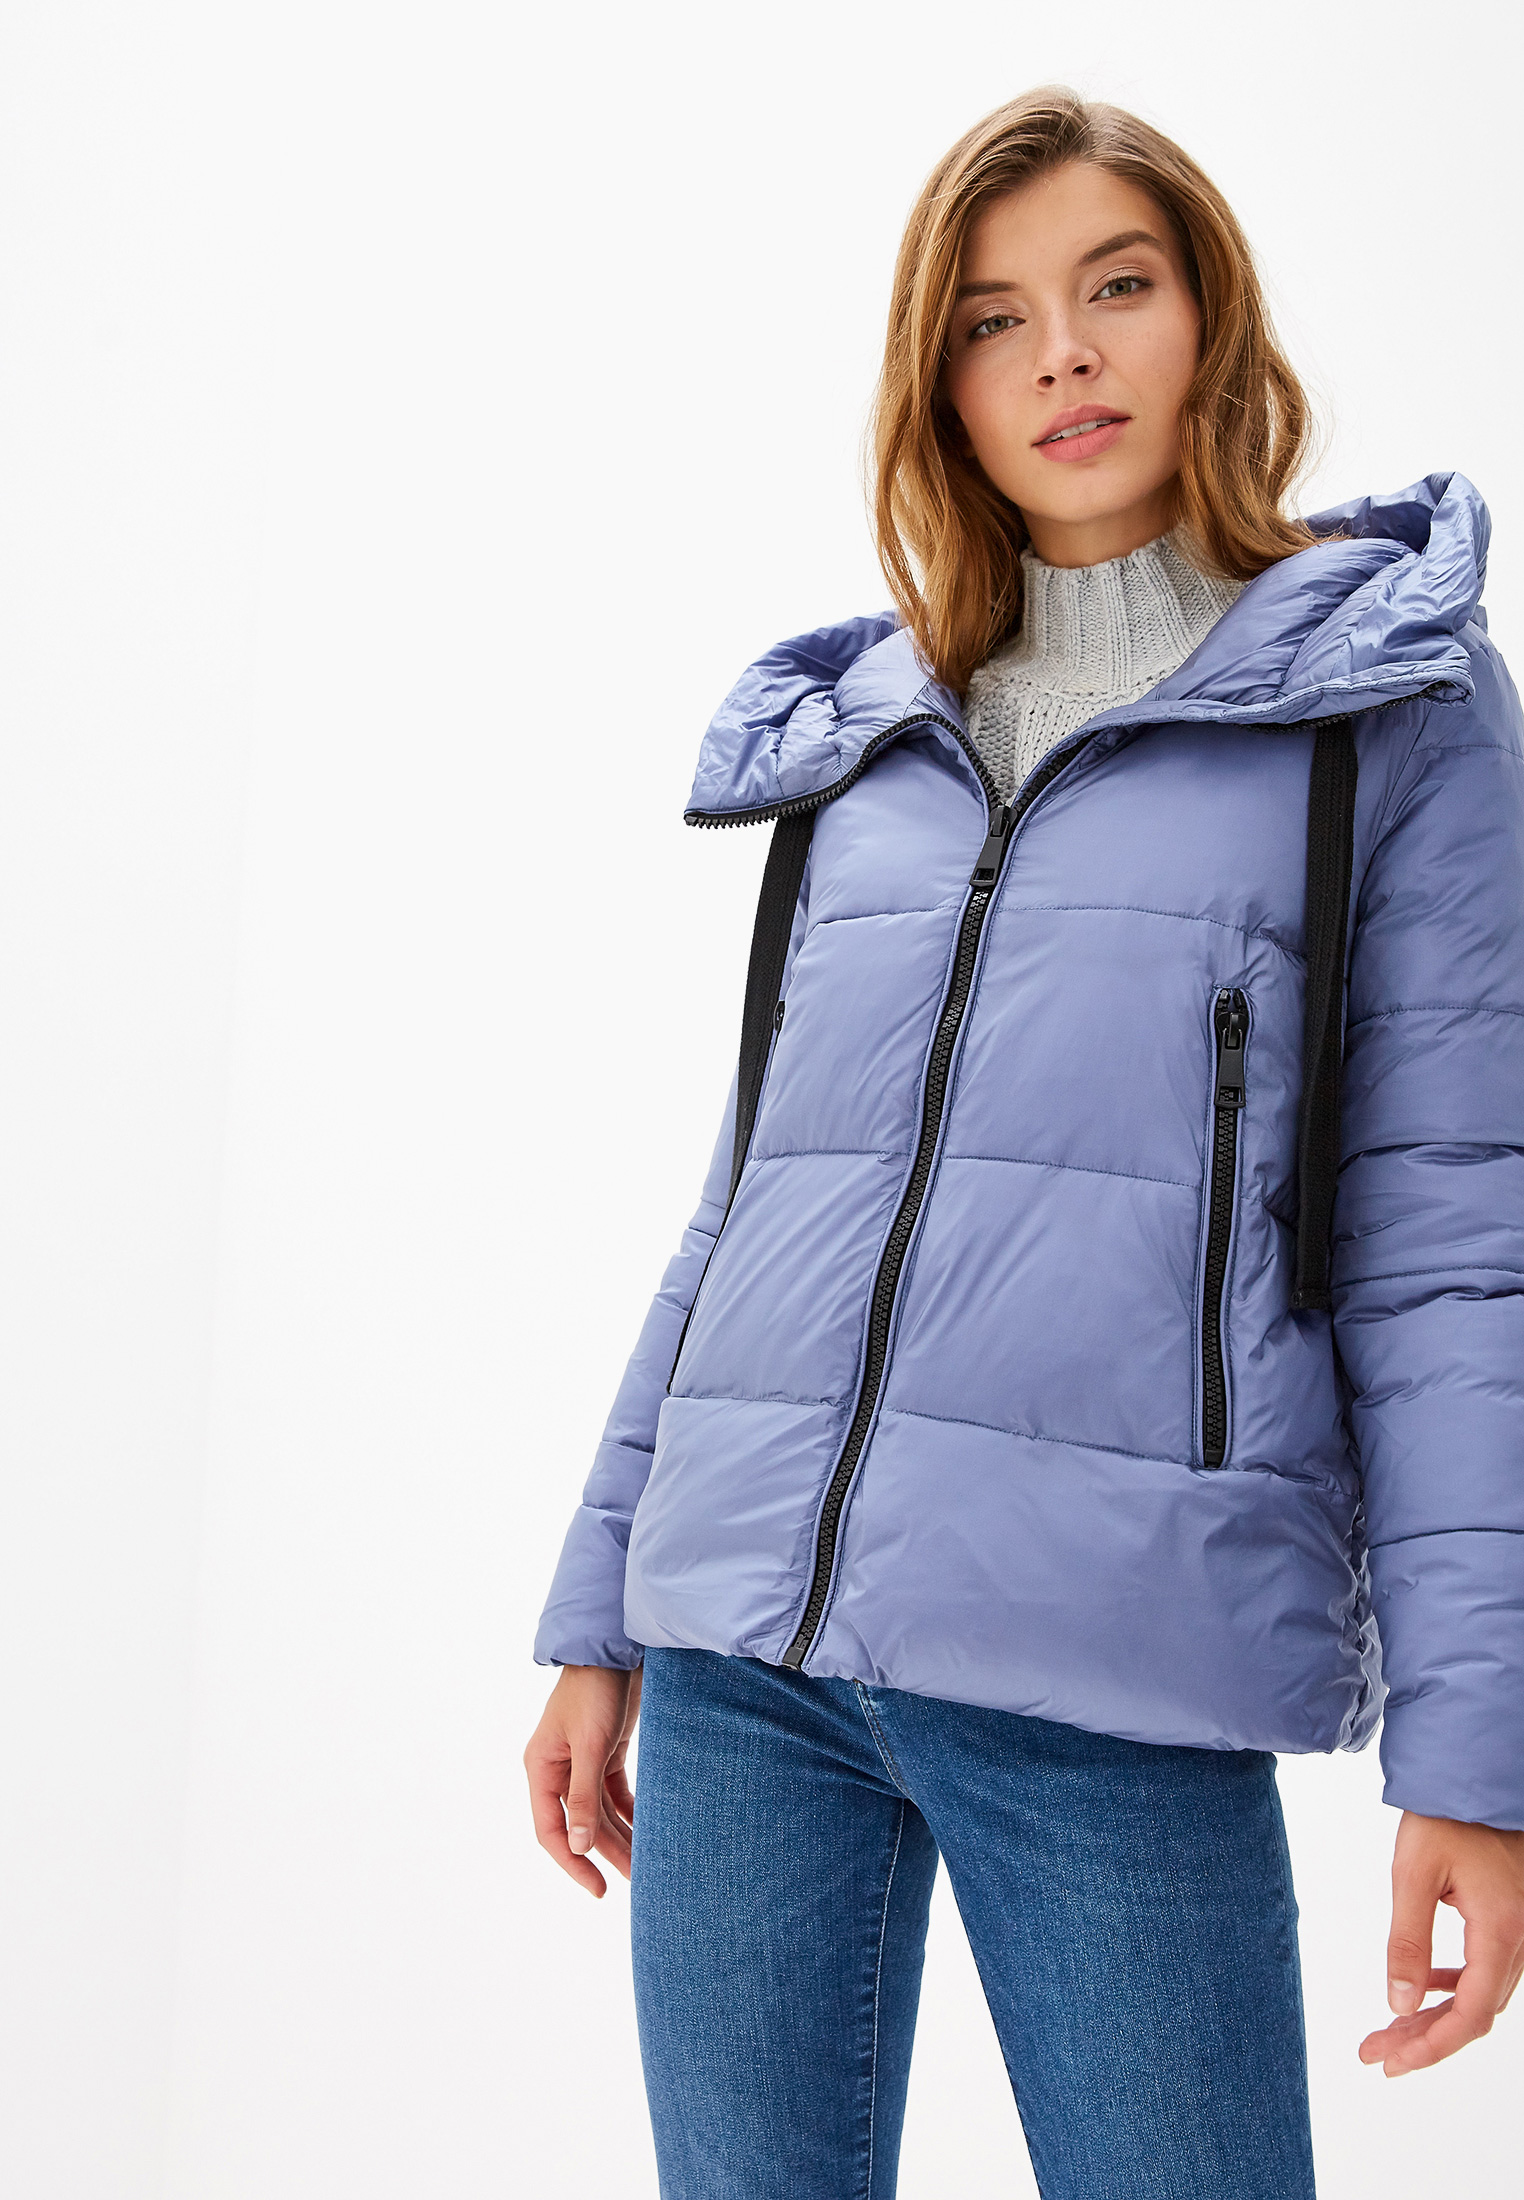 Куртка утепленная, Savage, цвет: голубой. Артикул: SA004EWGESE7. Одежда / Верхняя одежда / Пуховики и зимние куртки